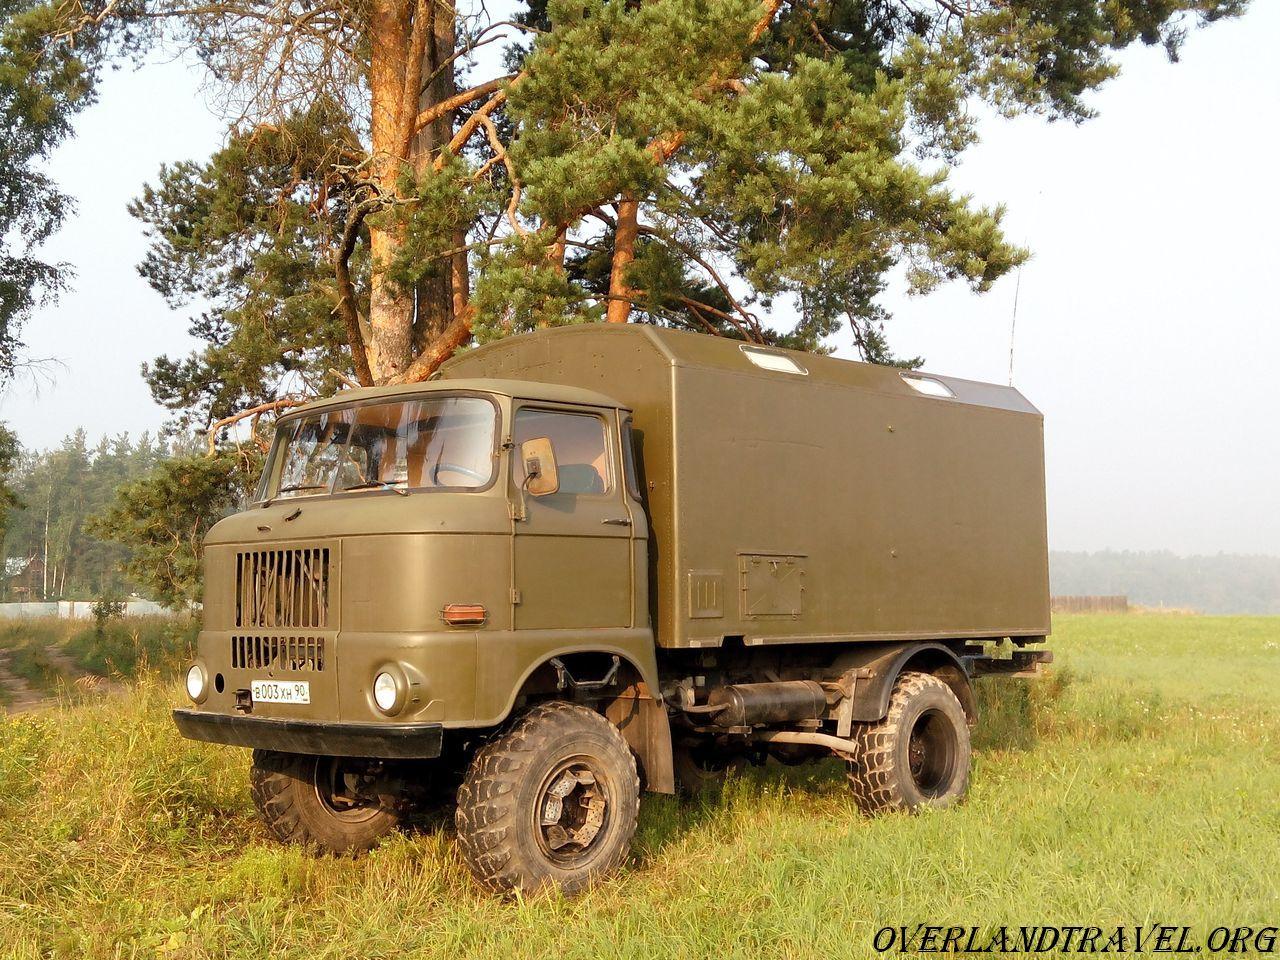 IFA-W50LA ИФА-В50 полноприводный грузовик производства ГДР